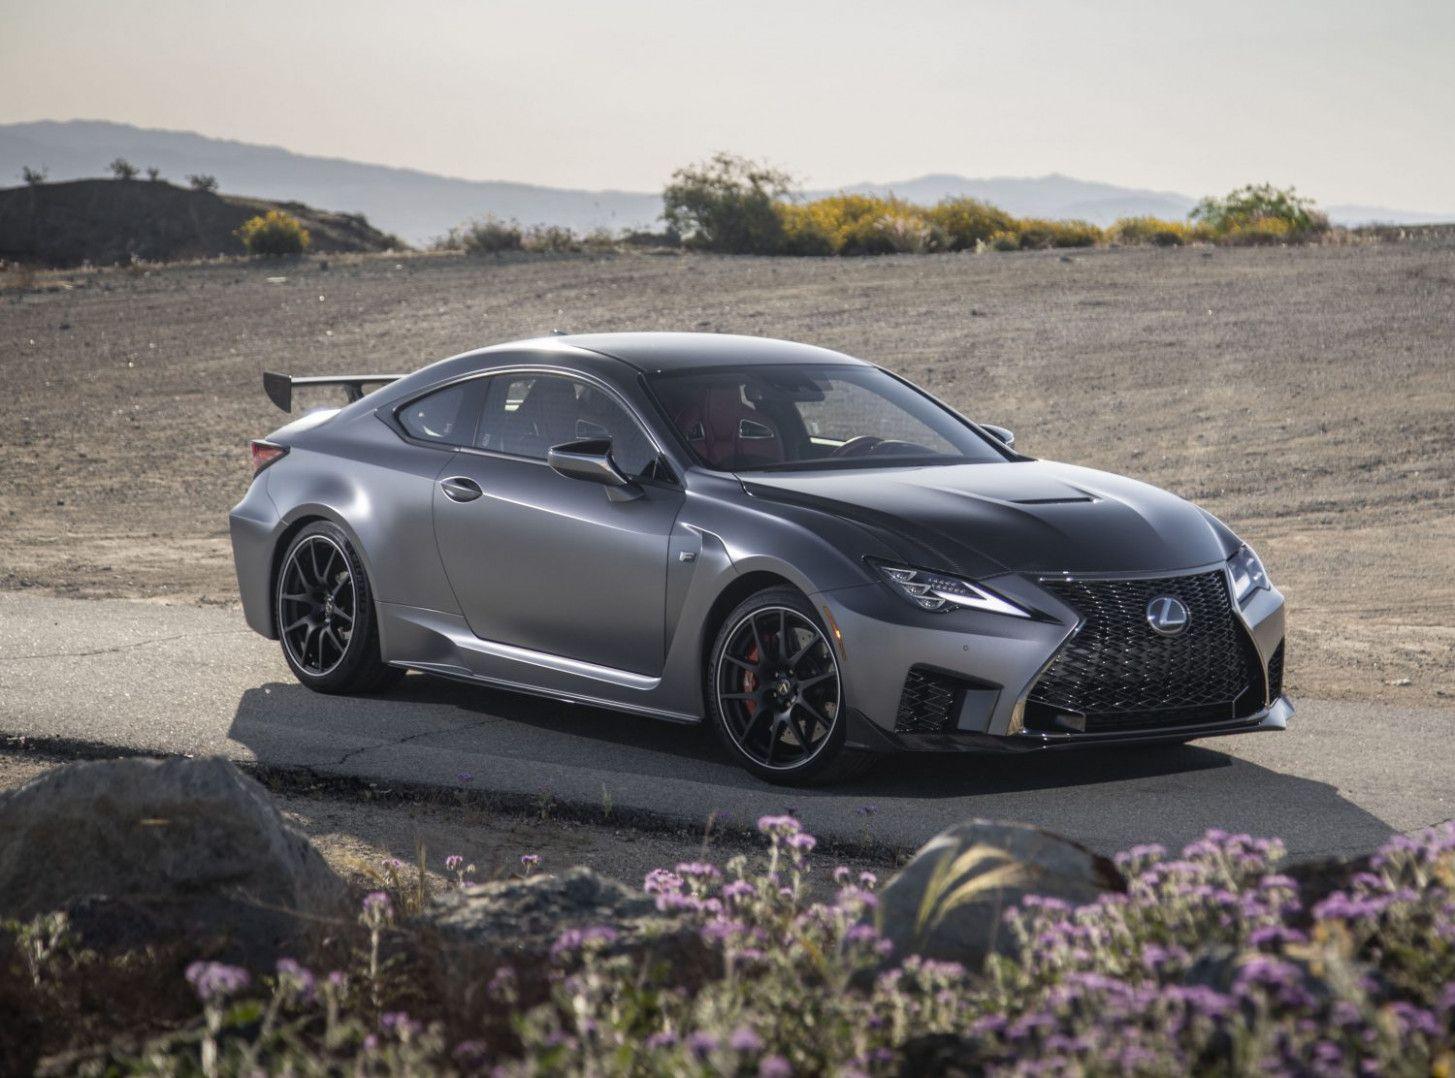 Lexus Lc F Rumors Heat Up With Hot New Renders Autoguide Com News Lexus Lc Lexus Auto News